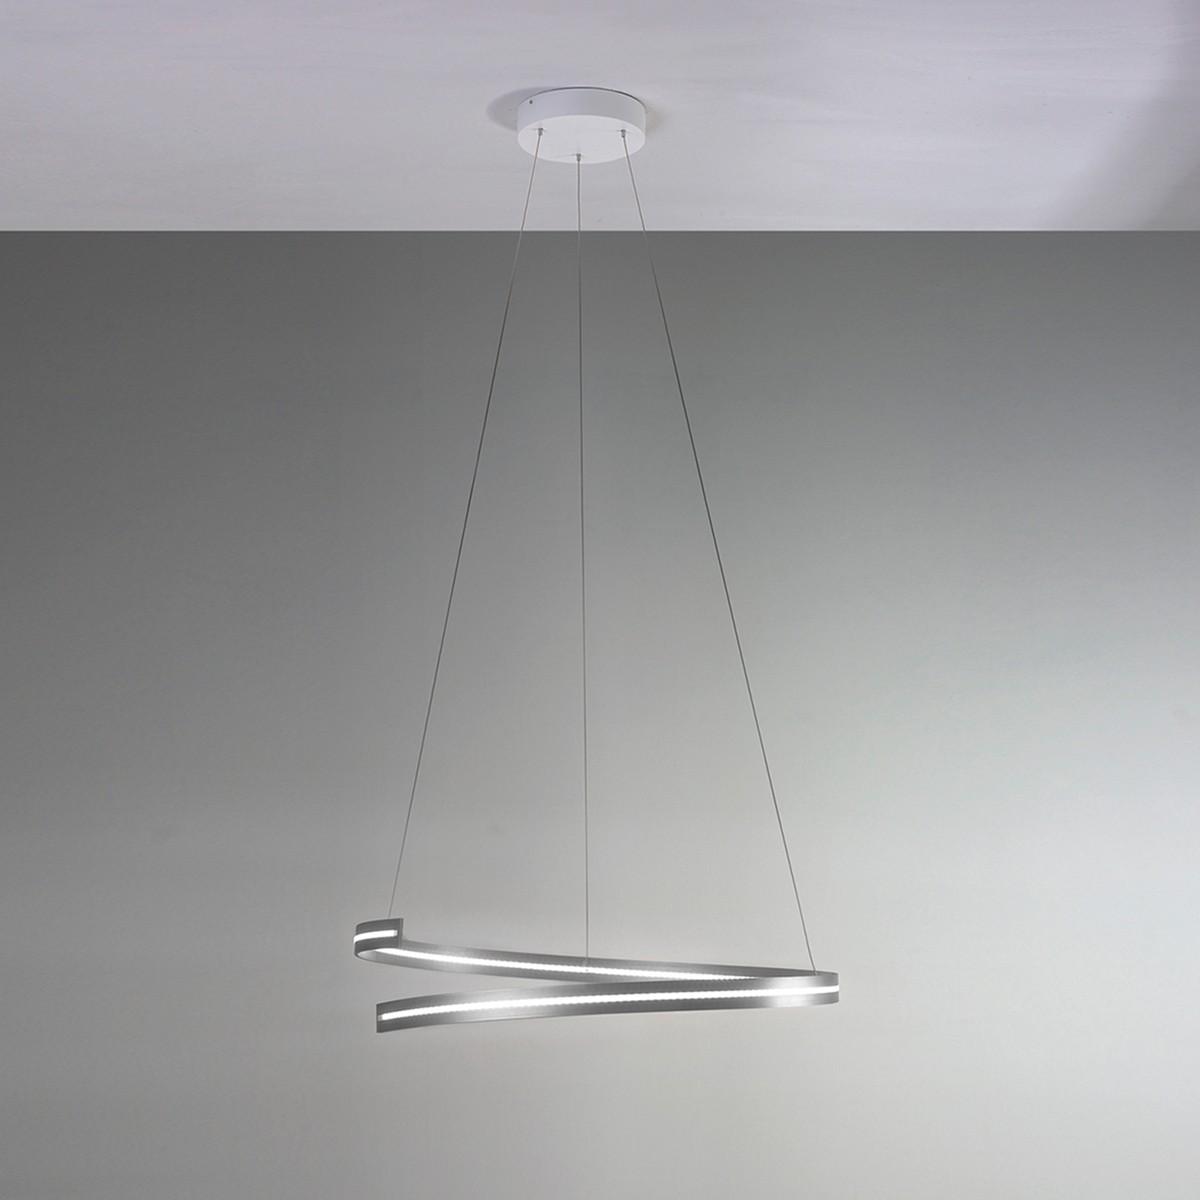 Bopp Break Pendelleuchte Ø: 70 cm, Aluminium geschliffen